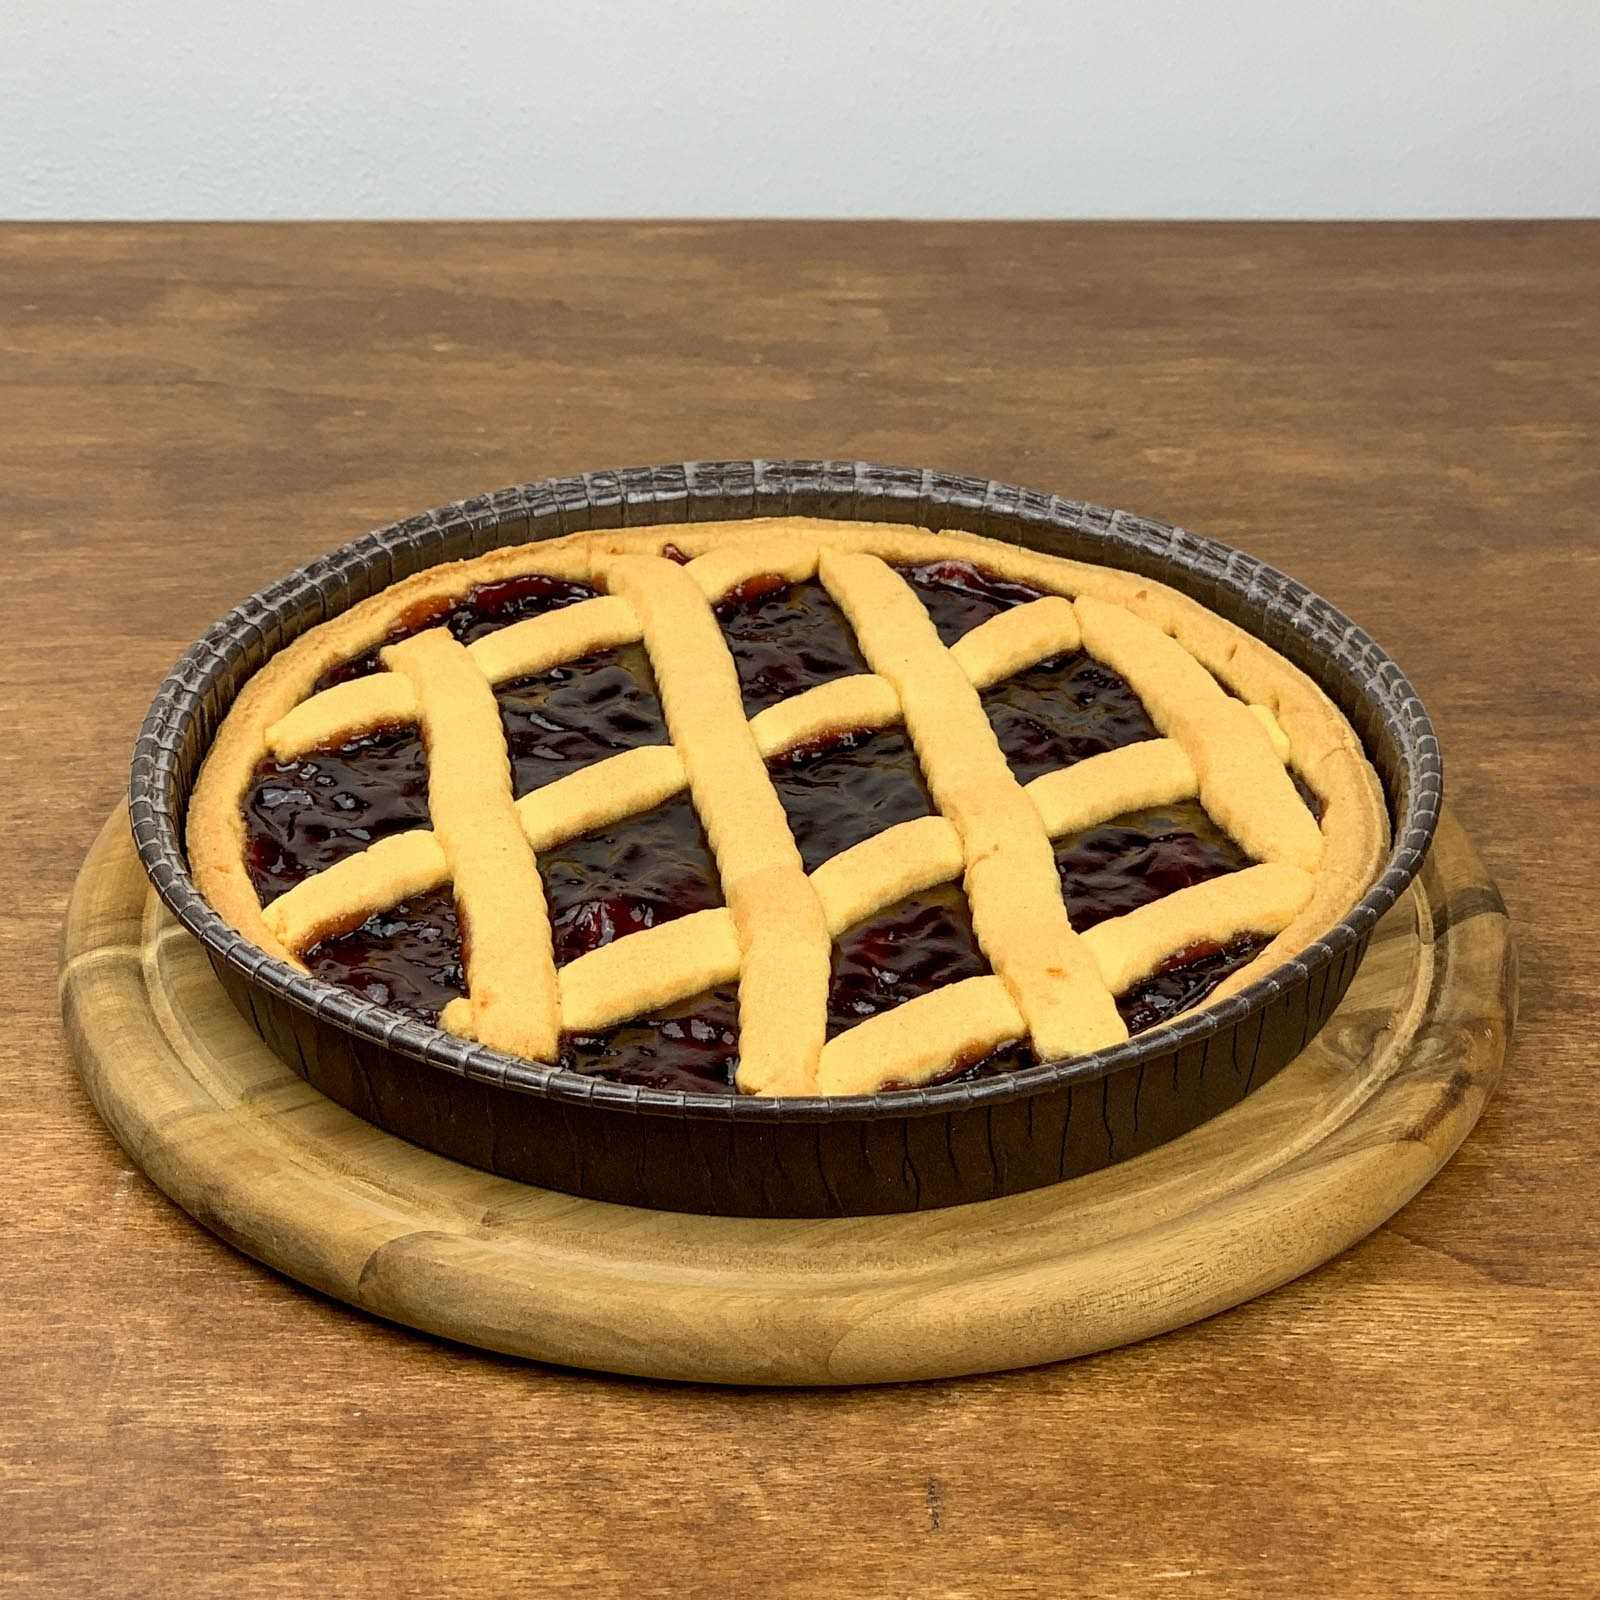 """Crostata"" Beerenmarmeladenkuchen."